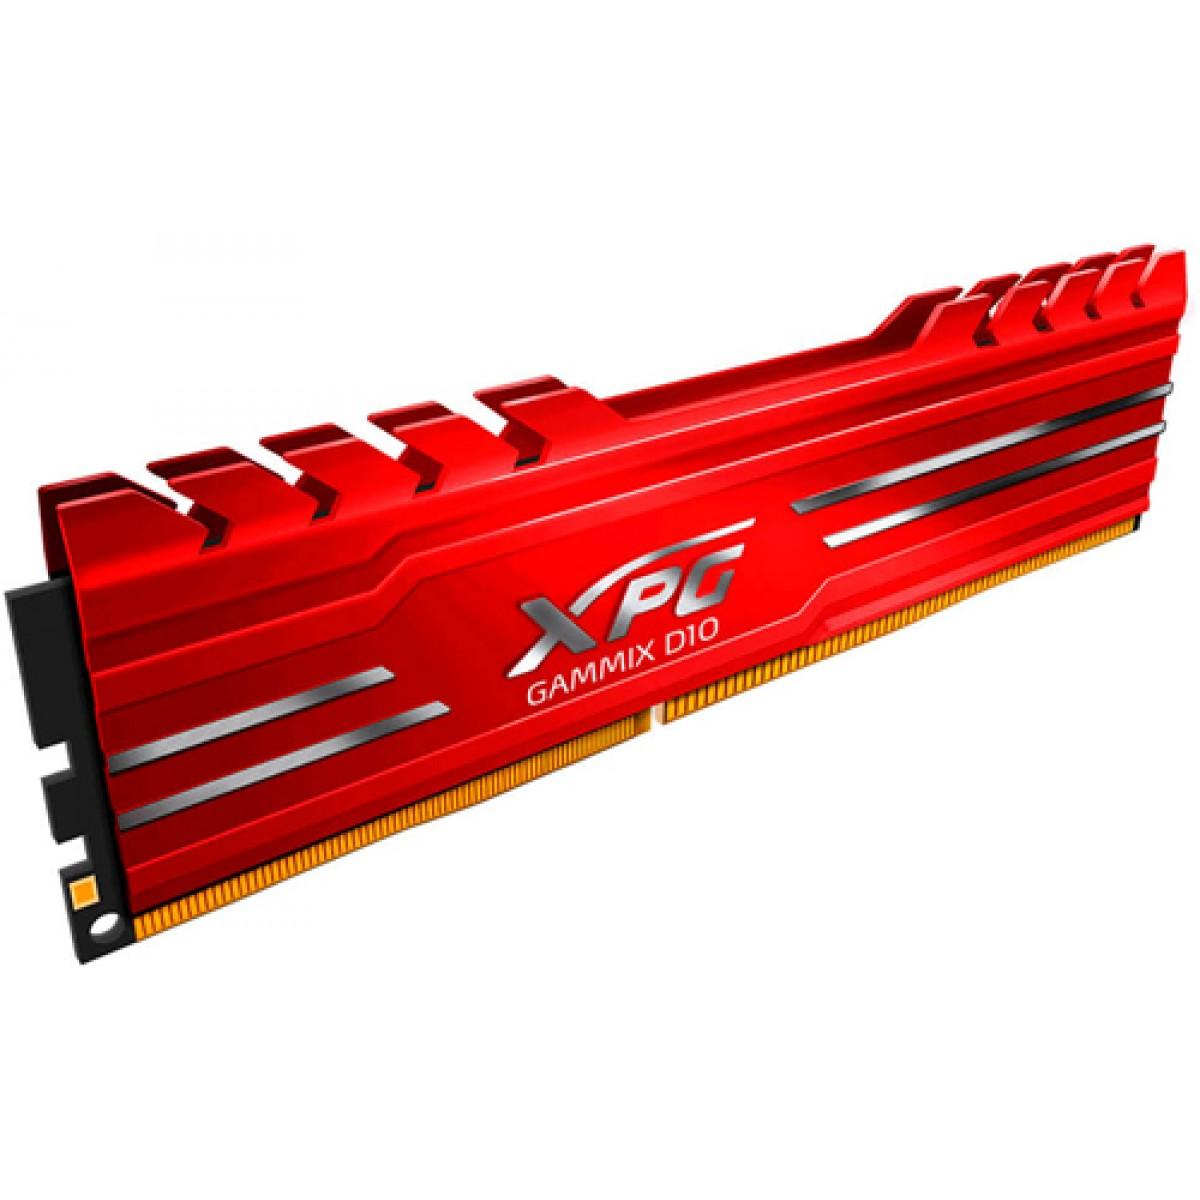 Memória DDR4 XPG Gammix D10, 8GB 3000Mhz, CL16, Red, AX4U300038G16A-SR10